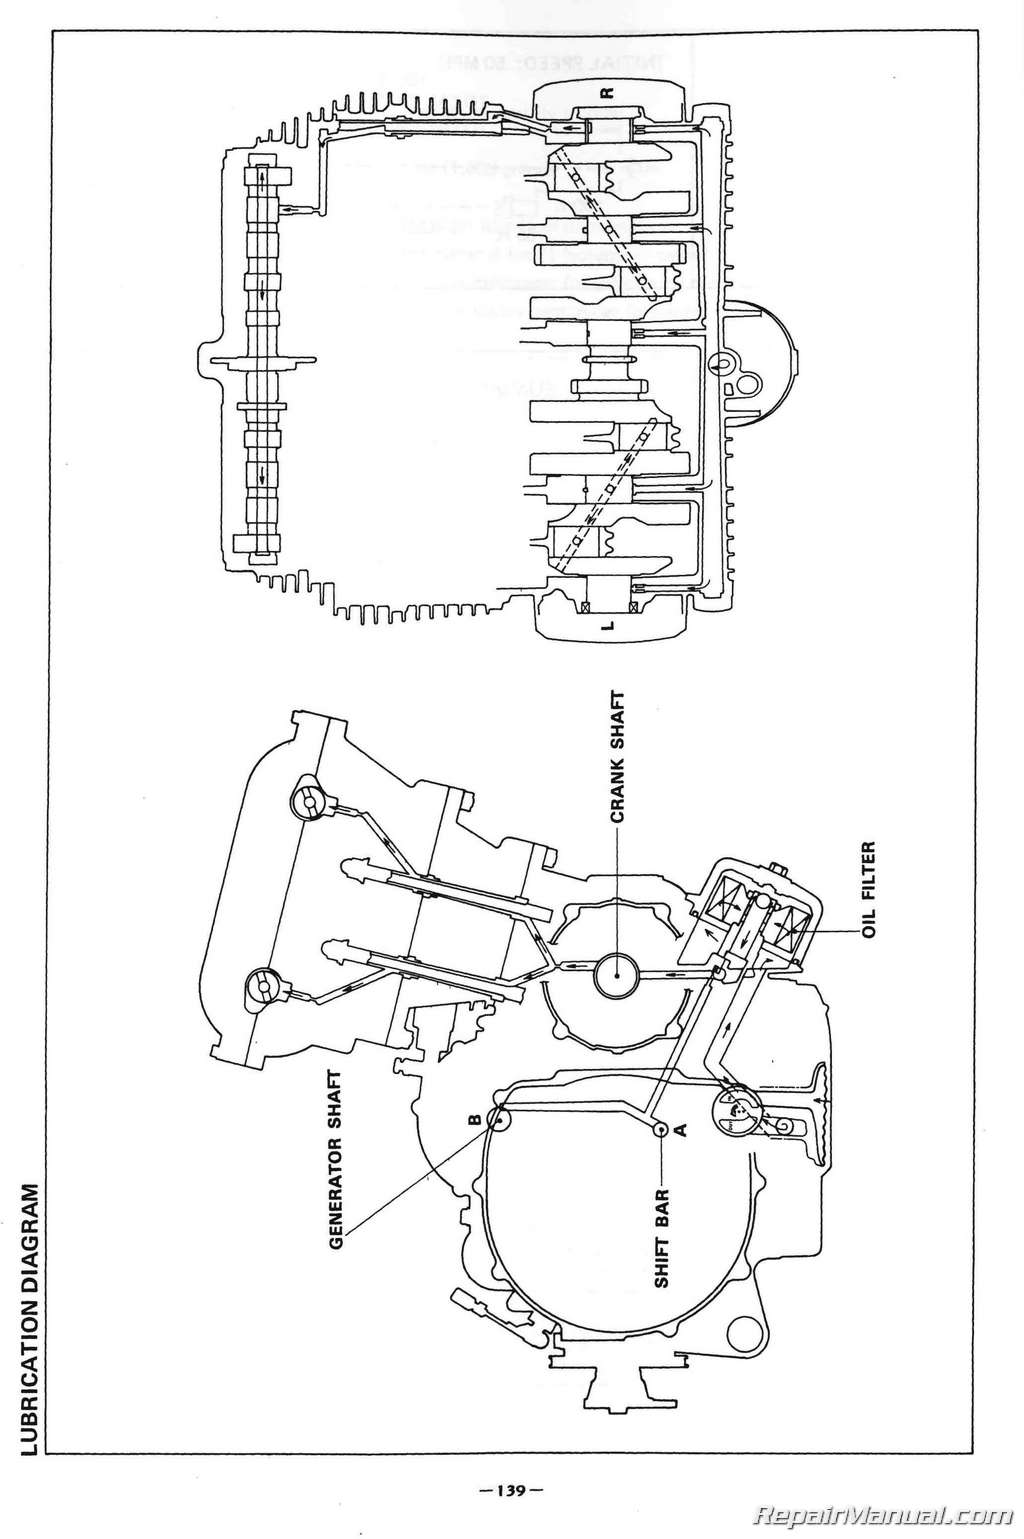 hight resolution of 83 yamaha 400 x wiring diagram